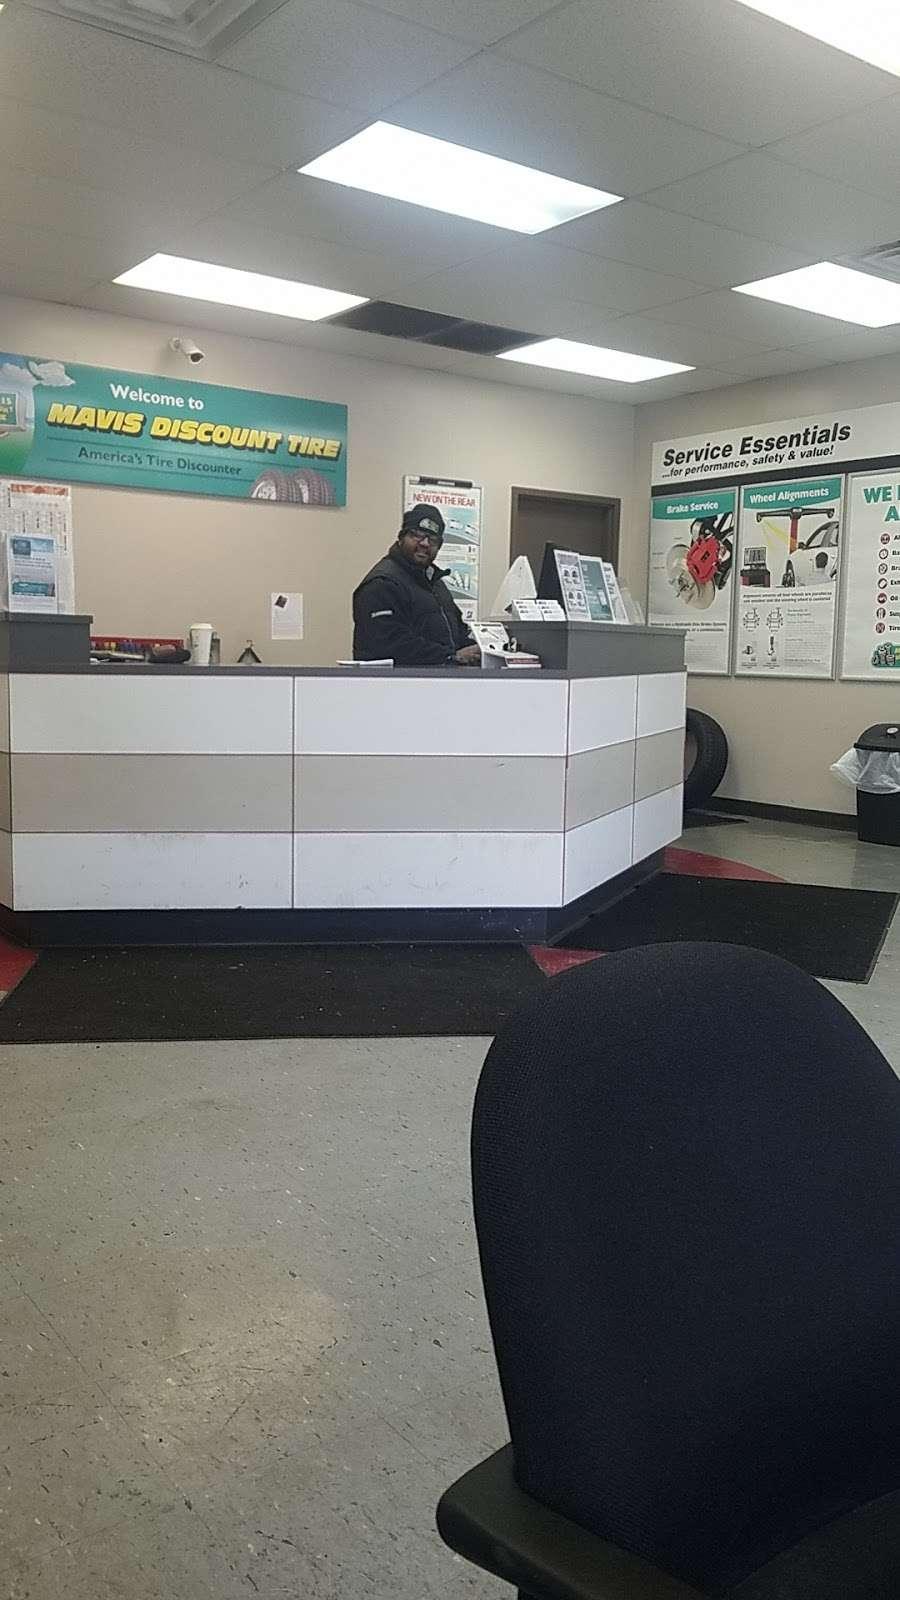 Mavis Discount Tire - car repair  | Photo 6 of 8 | Address: 67 US-46 E, Ridgefield Park, NJ 07660, USA | Phone: (201) 510-3785